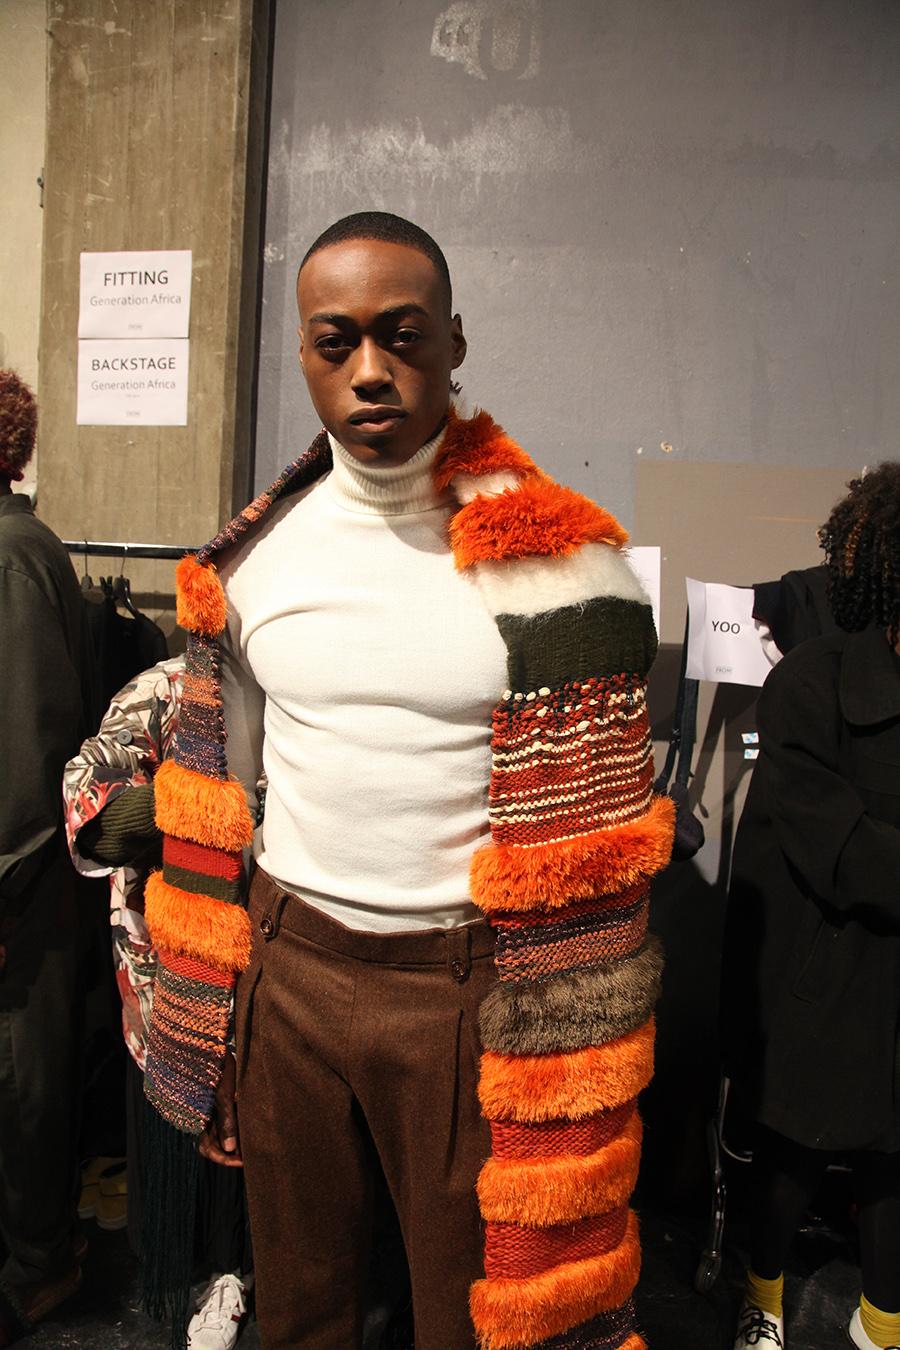 Lukhanyo Mdingi x Nicholas Coutts backstage at Generation Africa (c) Trevor Stuurman (21)